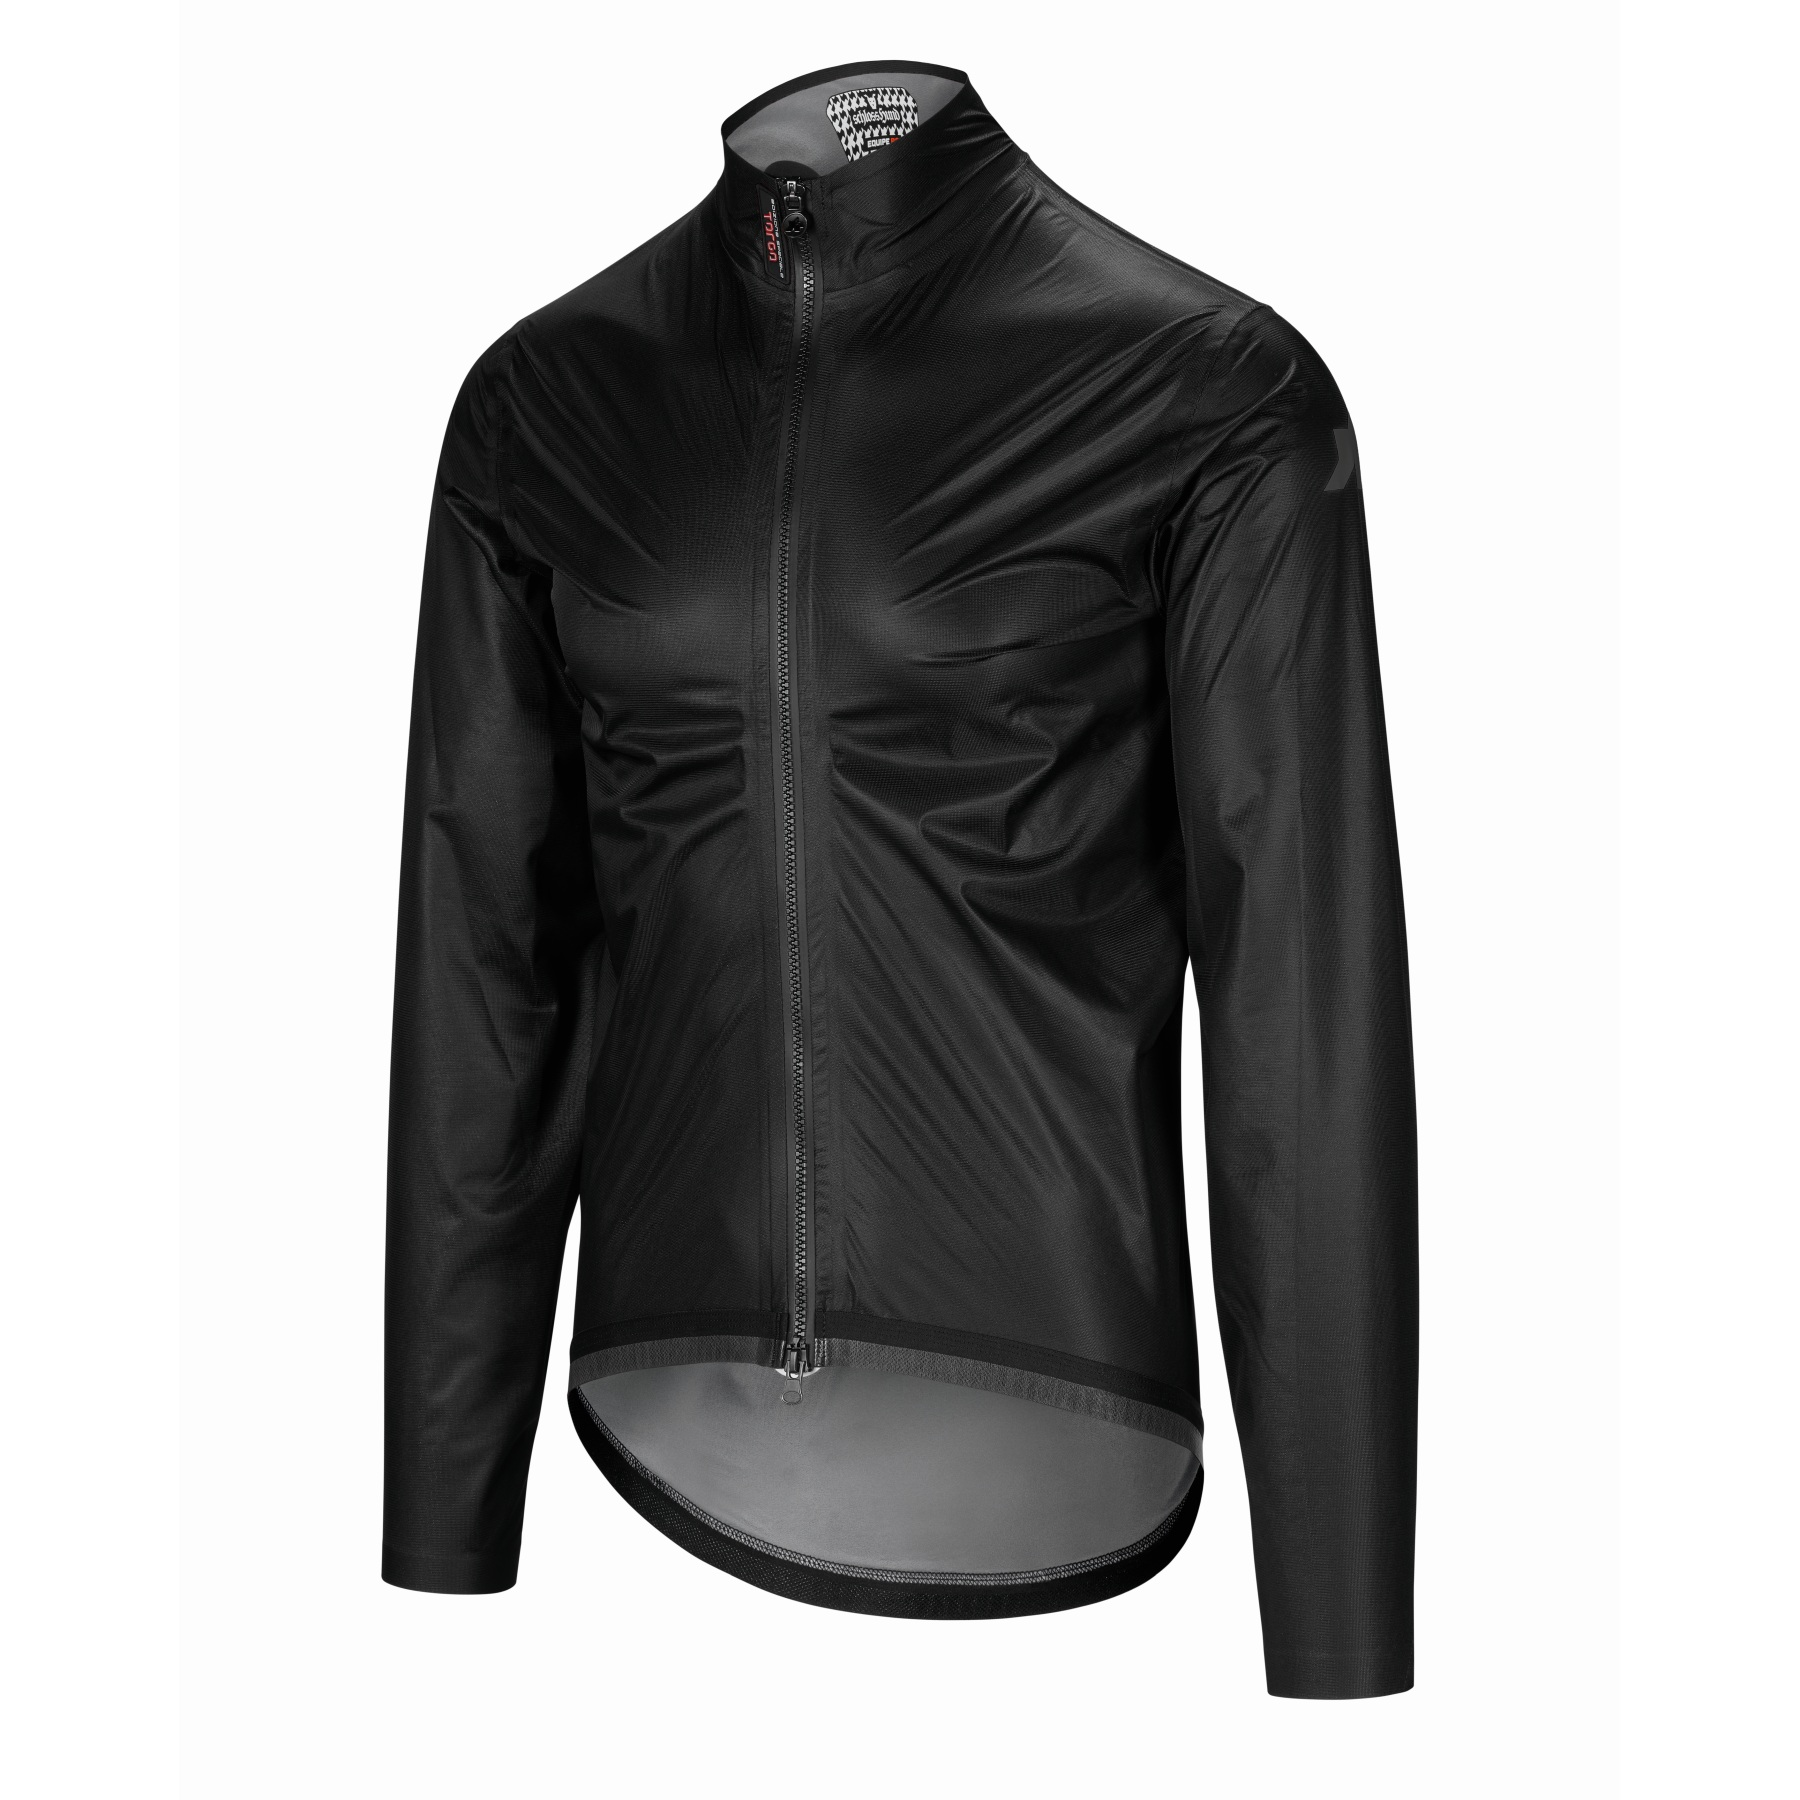 Image of Assos EQUIPE RS Rain Jacket TARGA - black